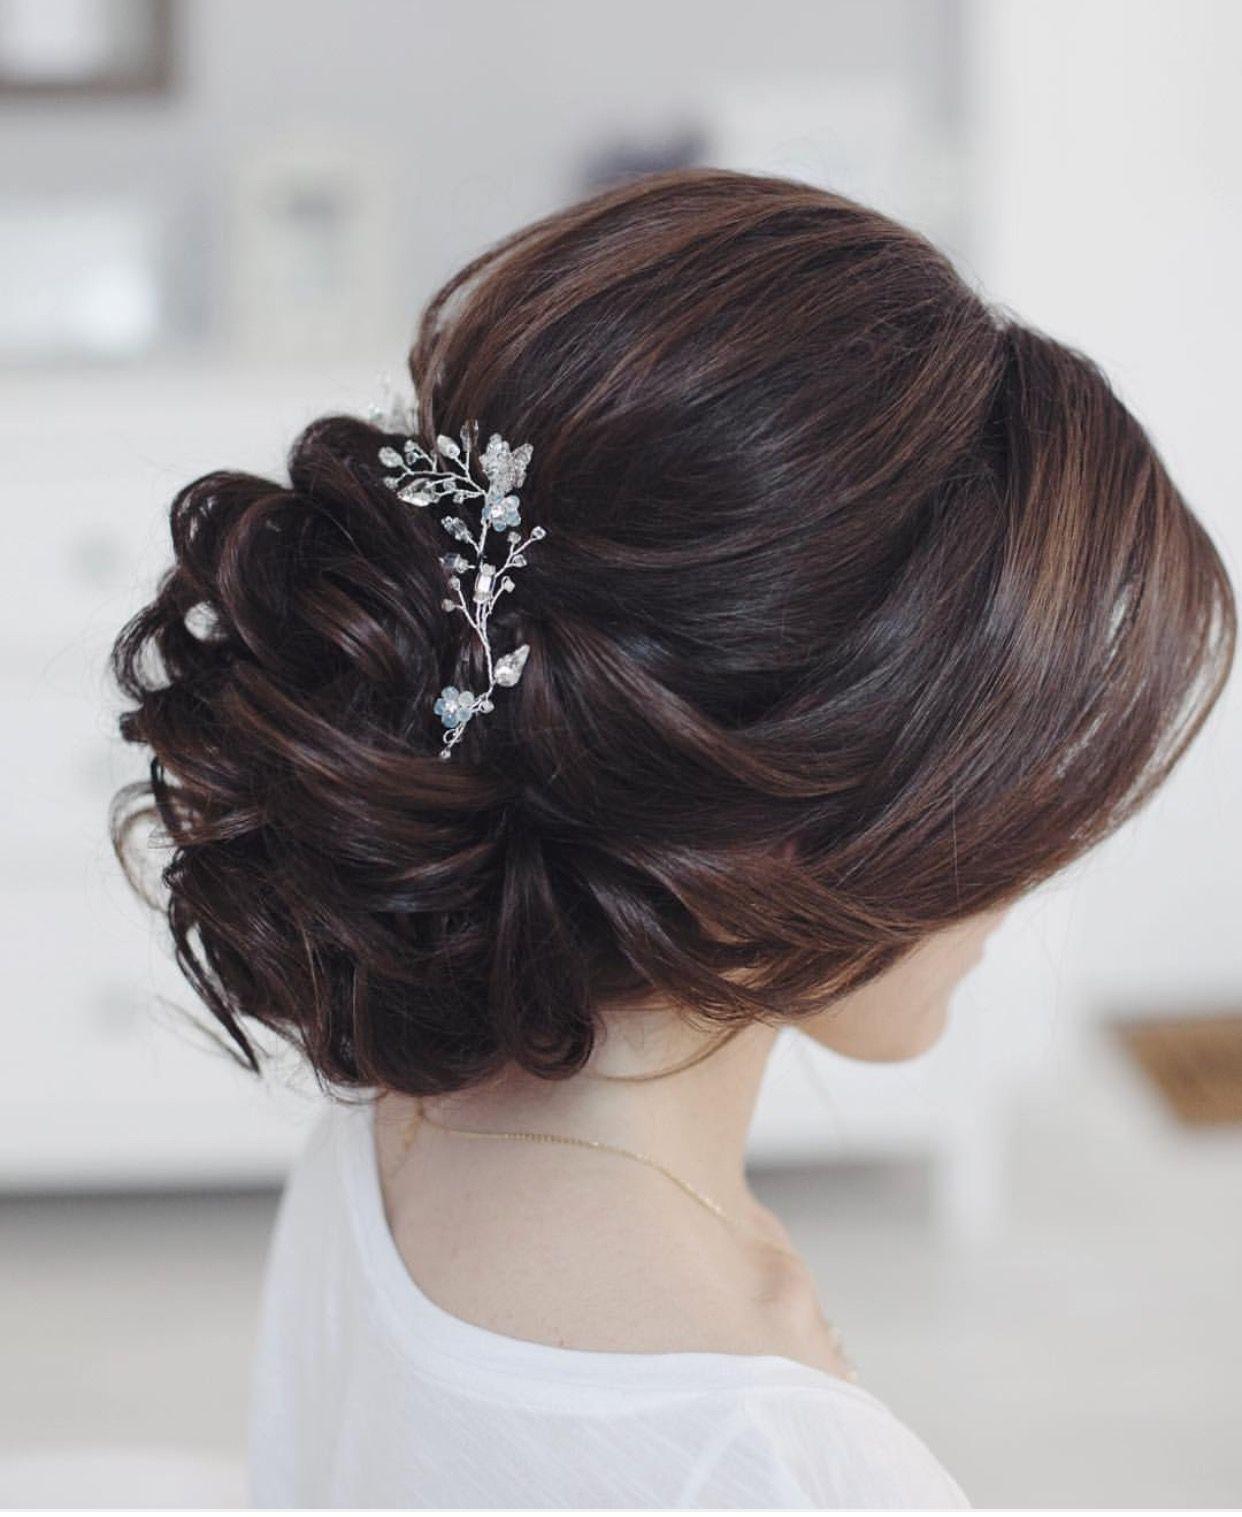 Pin by gloria vega on r a n d o m pinterest hair style wedding